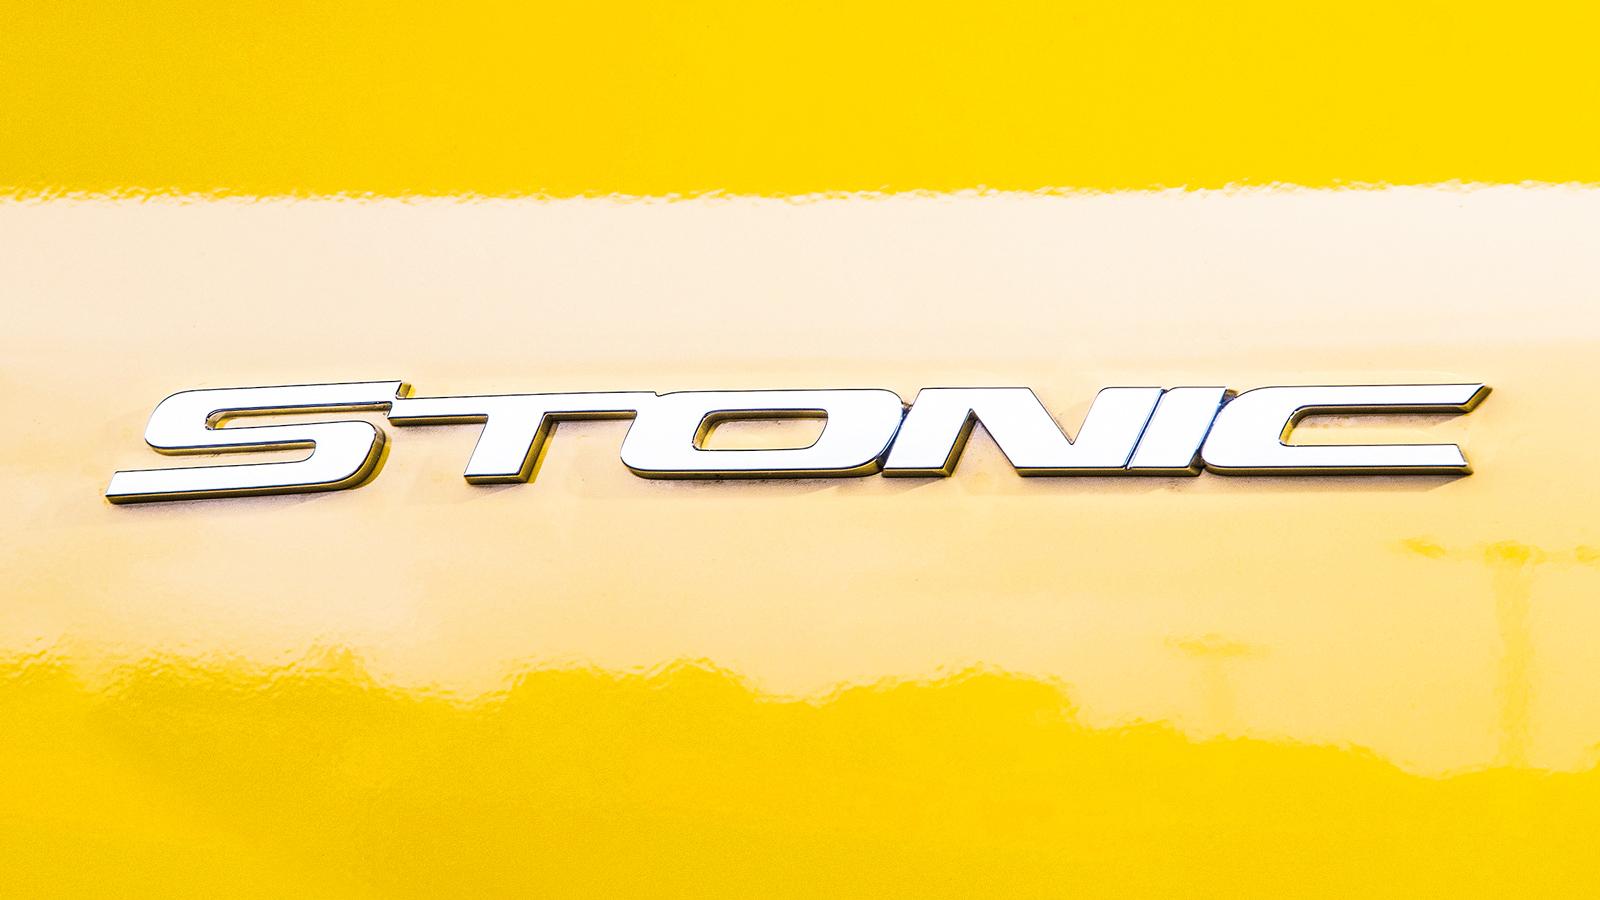 Stonic virá da nova fábrica da Kia no México